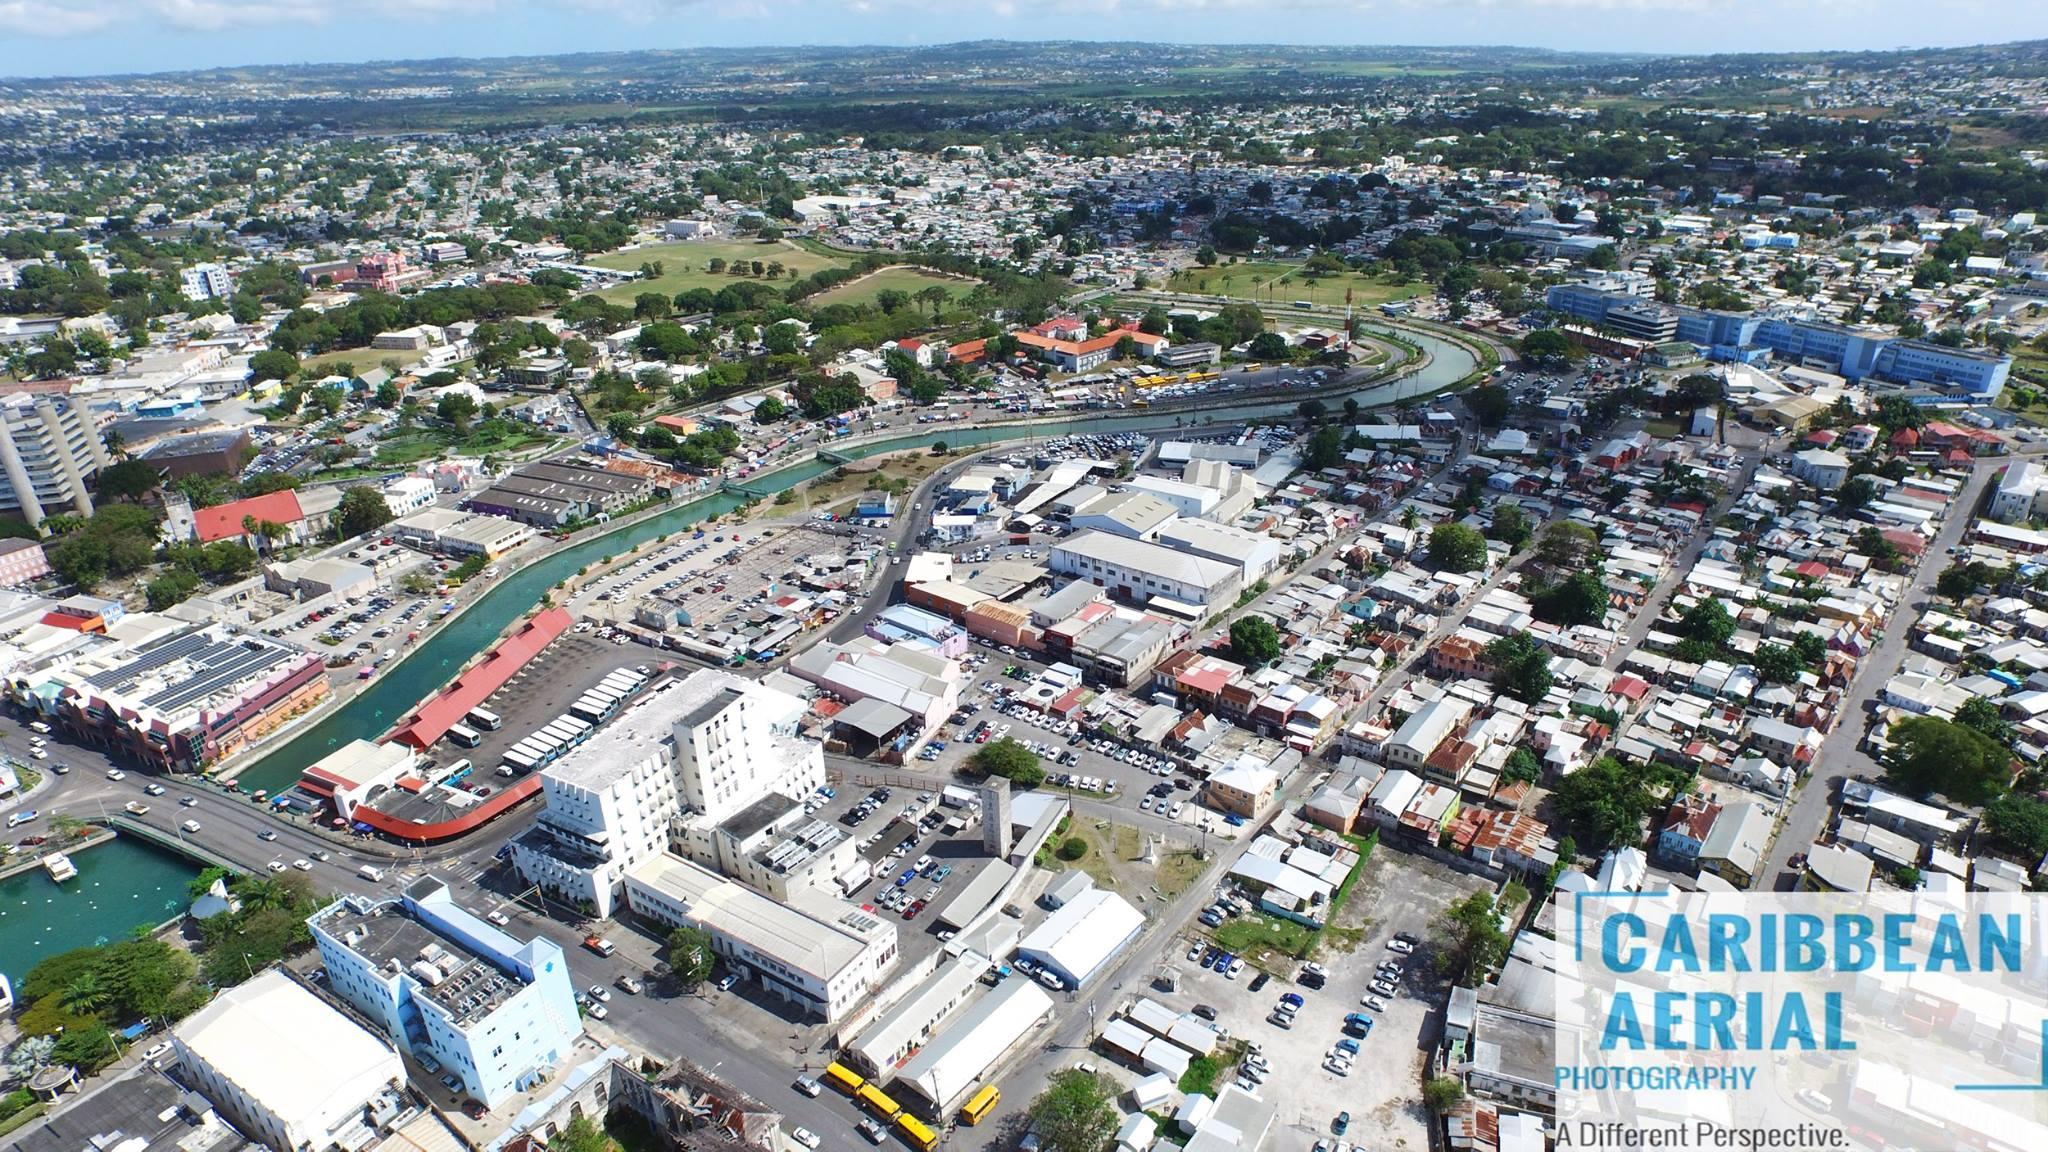 caribbean-aerial-photography-035